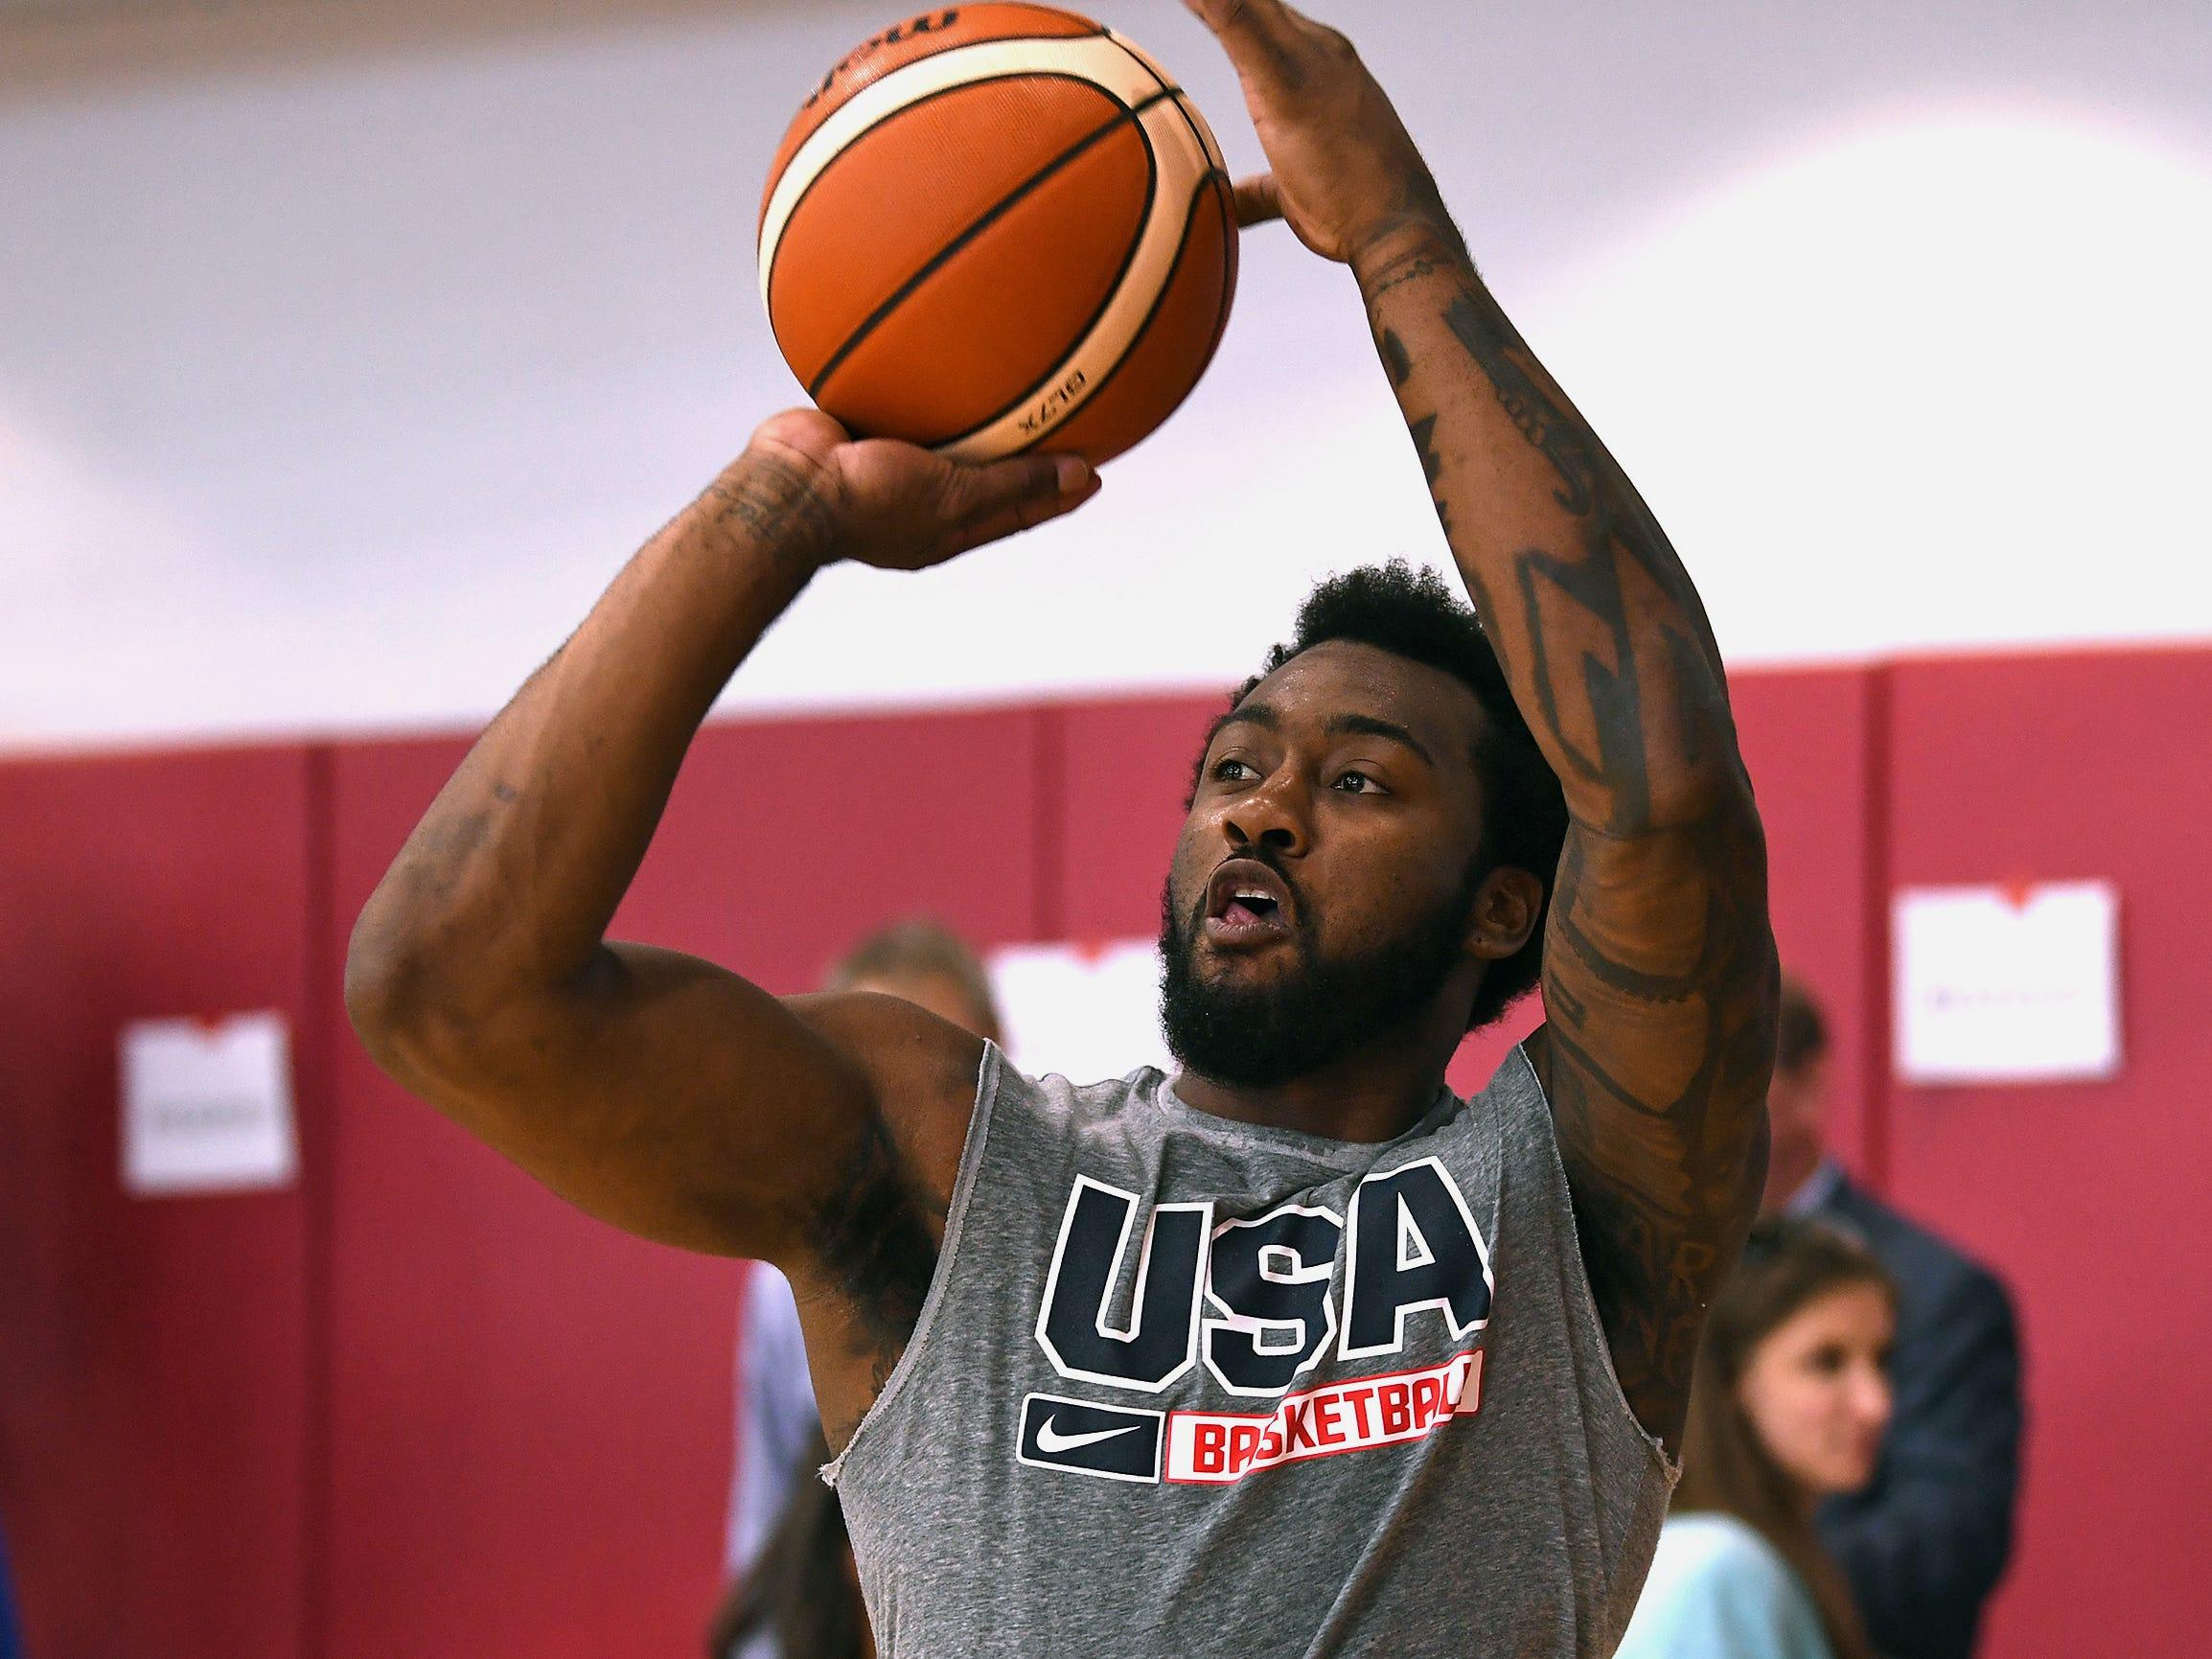 John Wall shoots during the 2018 USA Basketball National Team Minicamp.